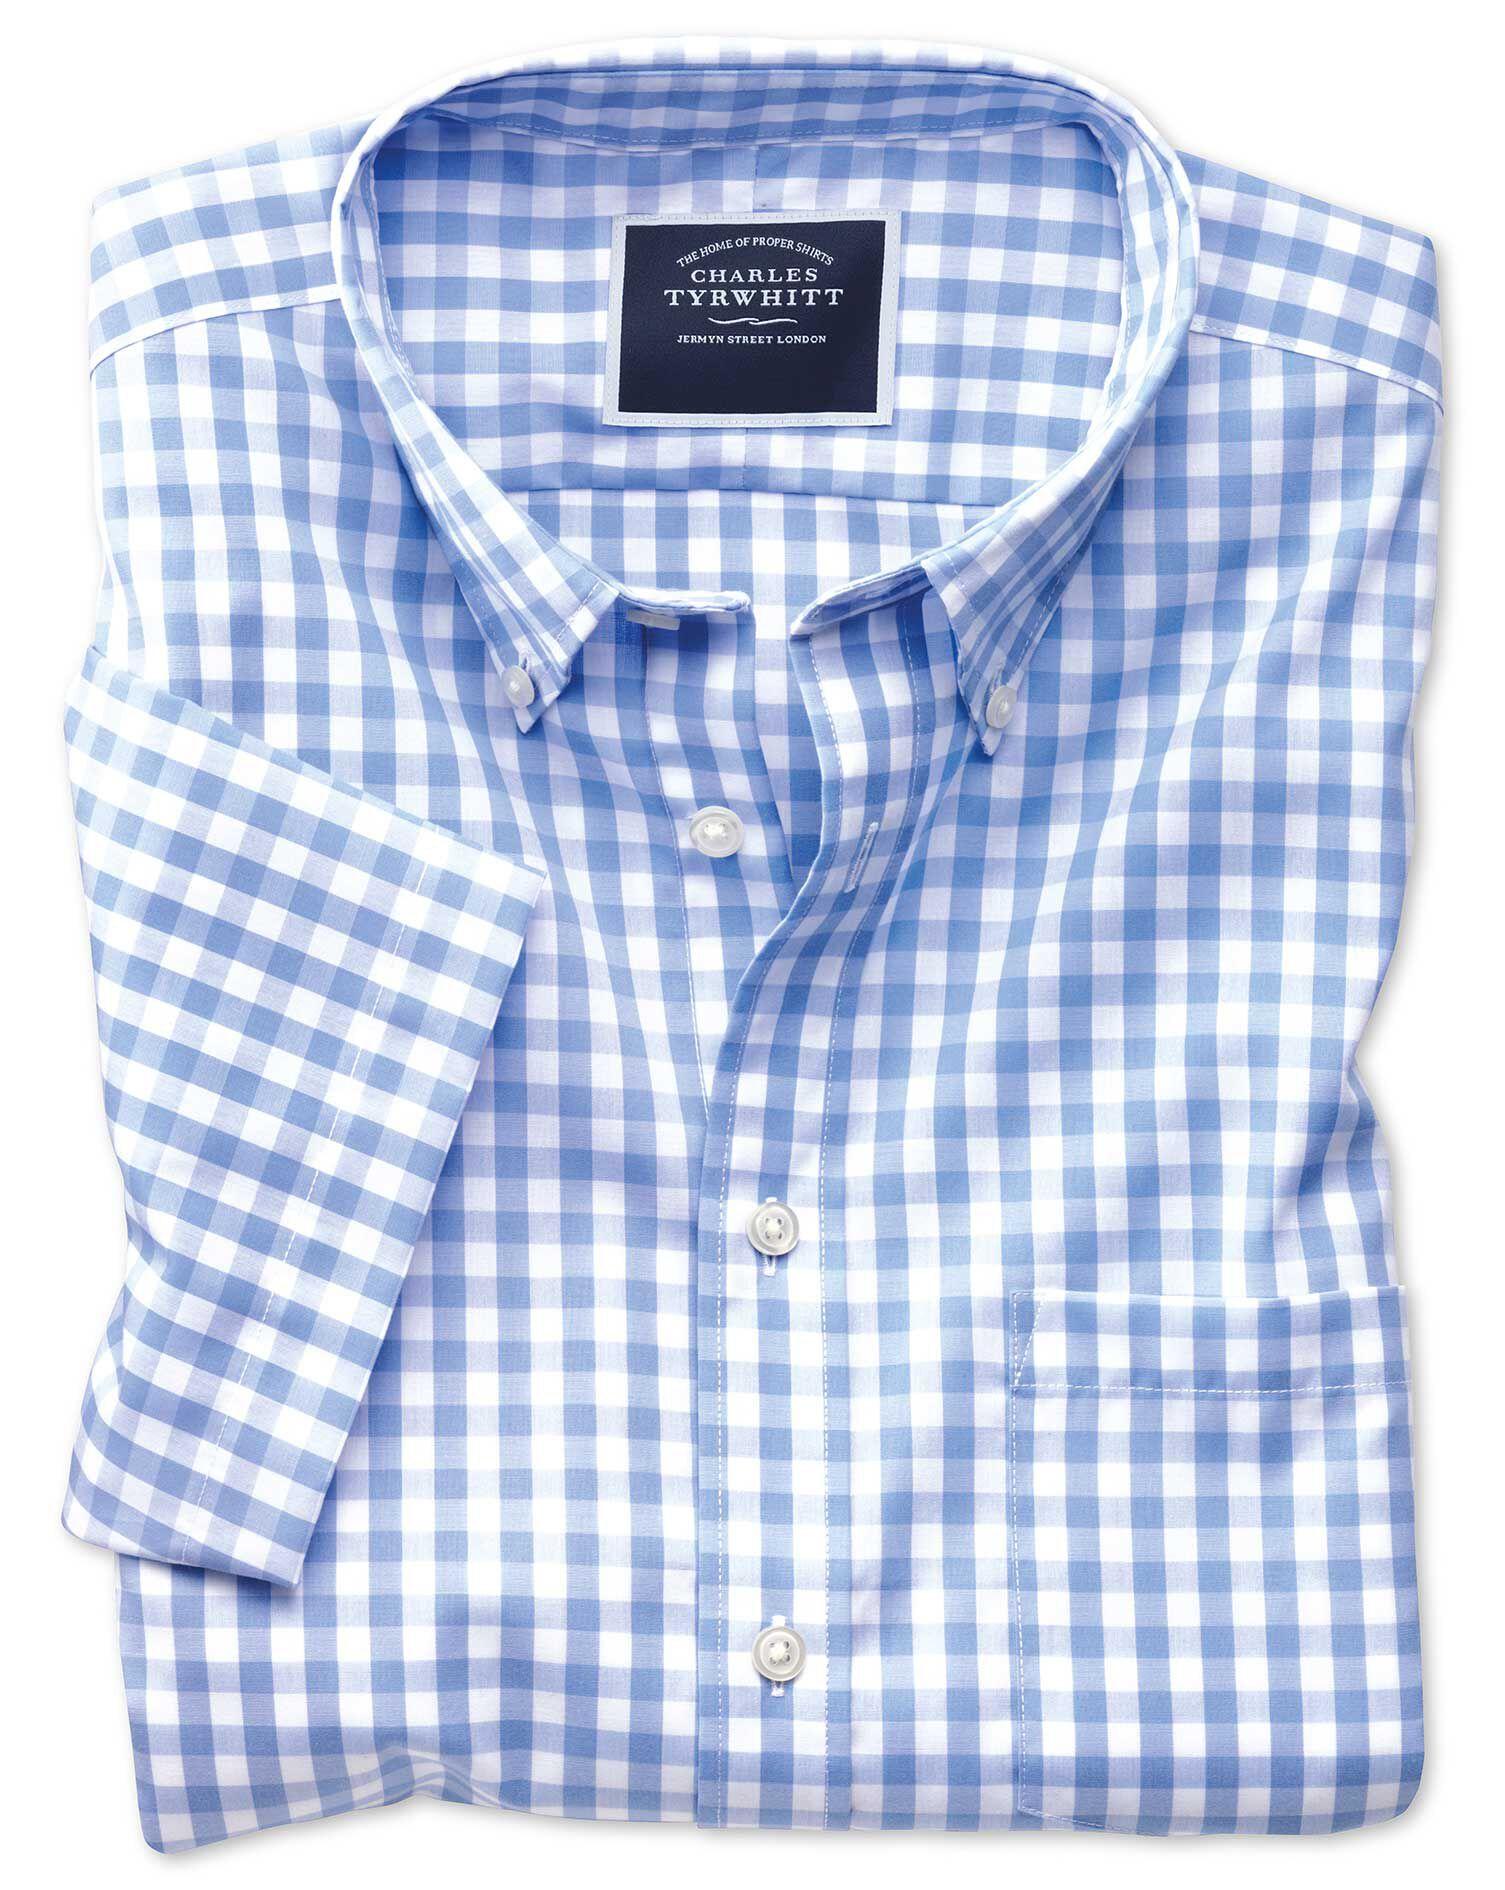 Classic Fit Non-Iron Poplin Short Sleeve Sky Blue Gingham Cotton Shirt Single Cuff Size XXXL by Char